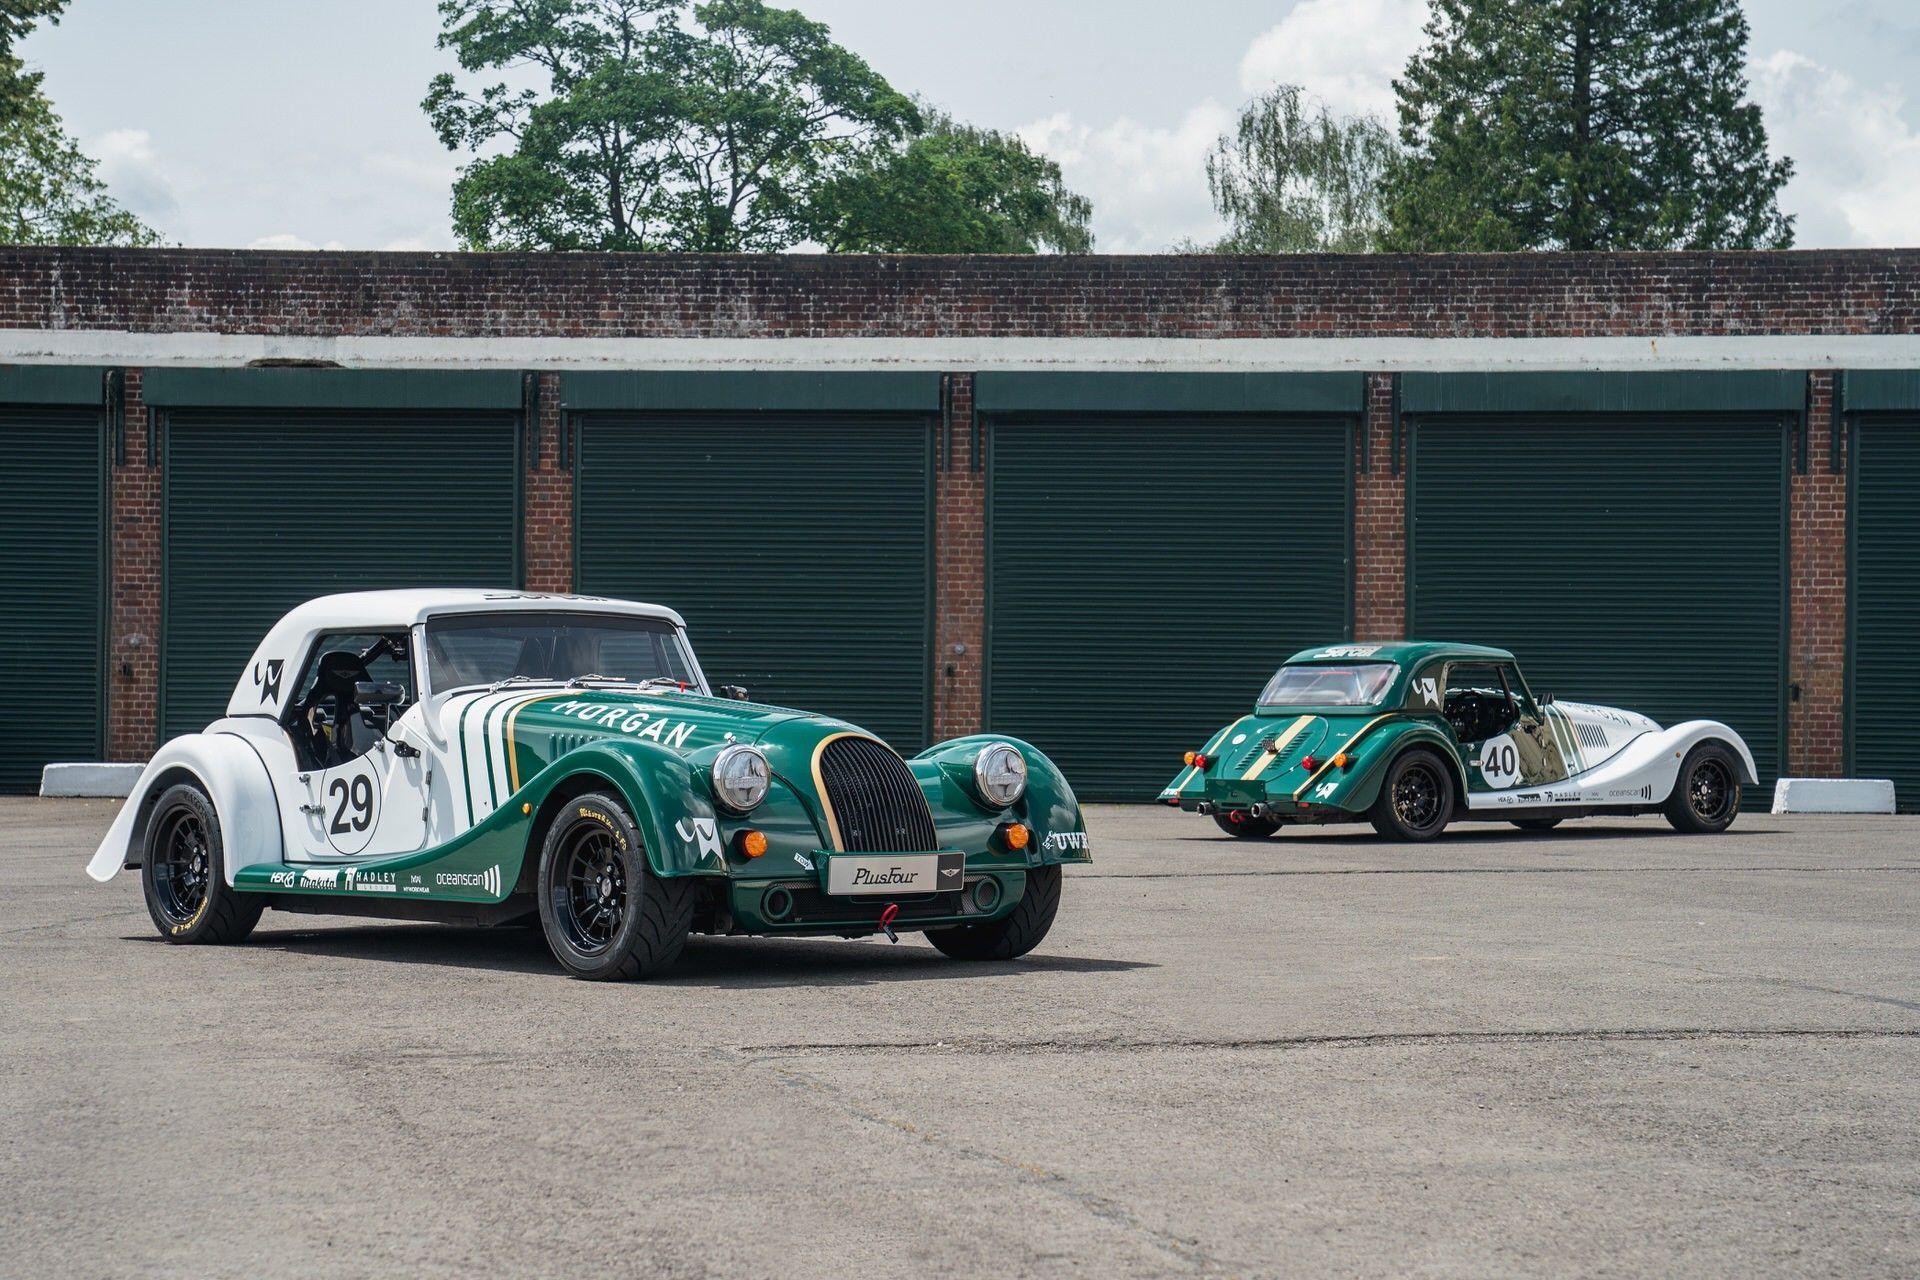 Morgan_Plus_Four_race_cars-0015